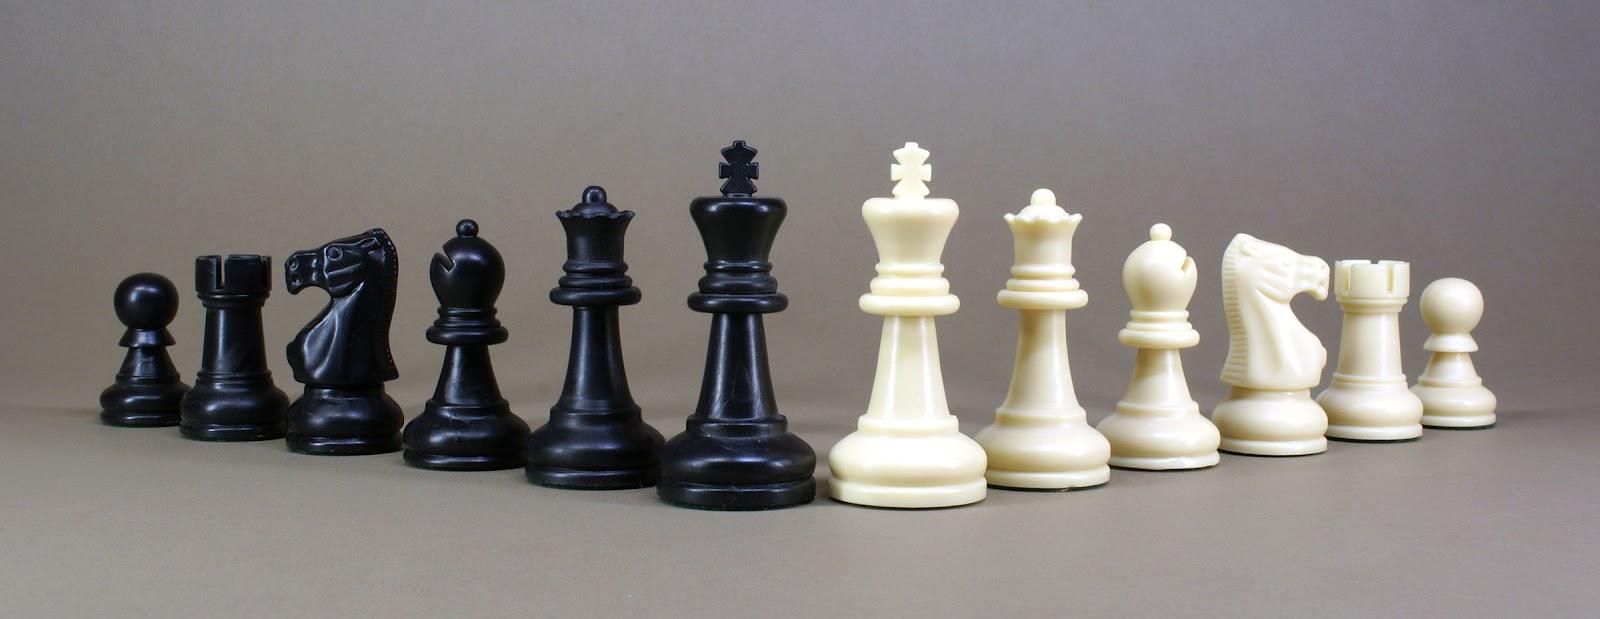 File:Chess Set.jpg